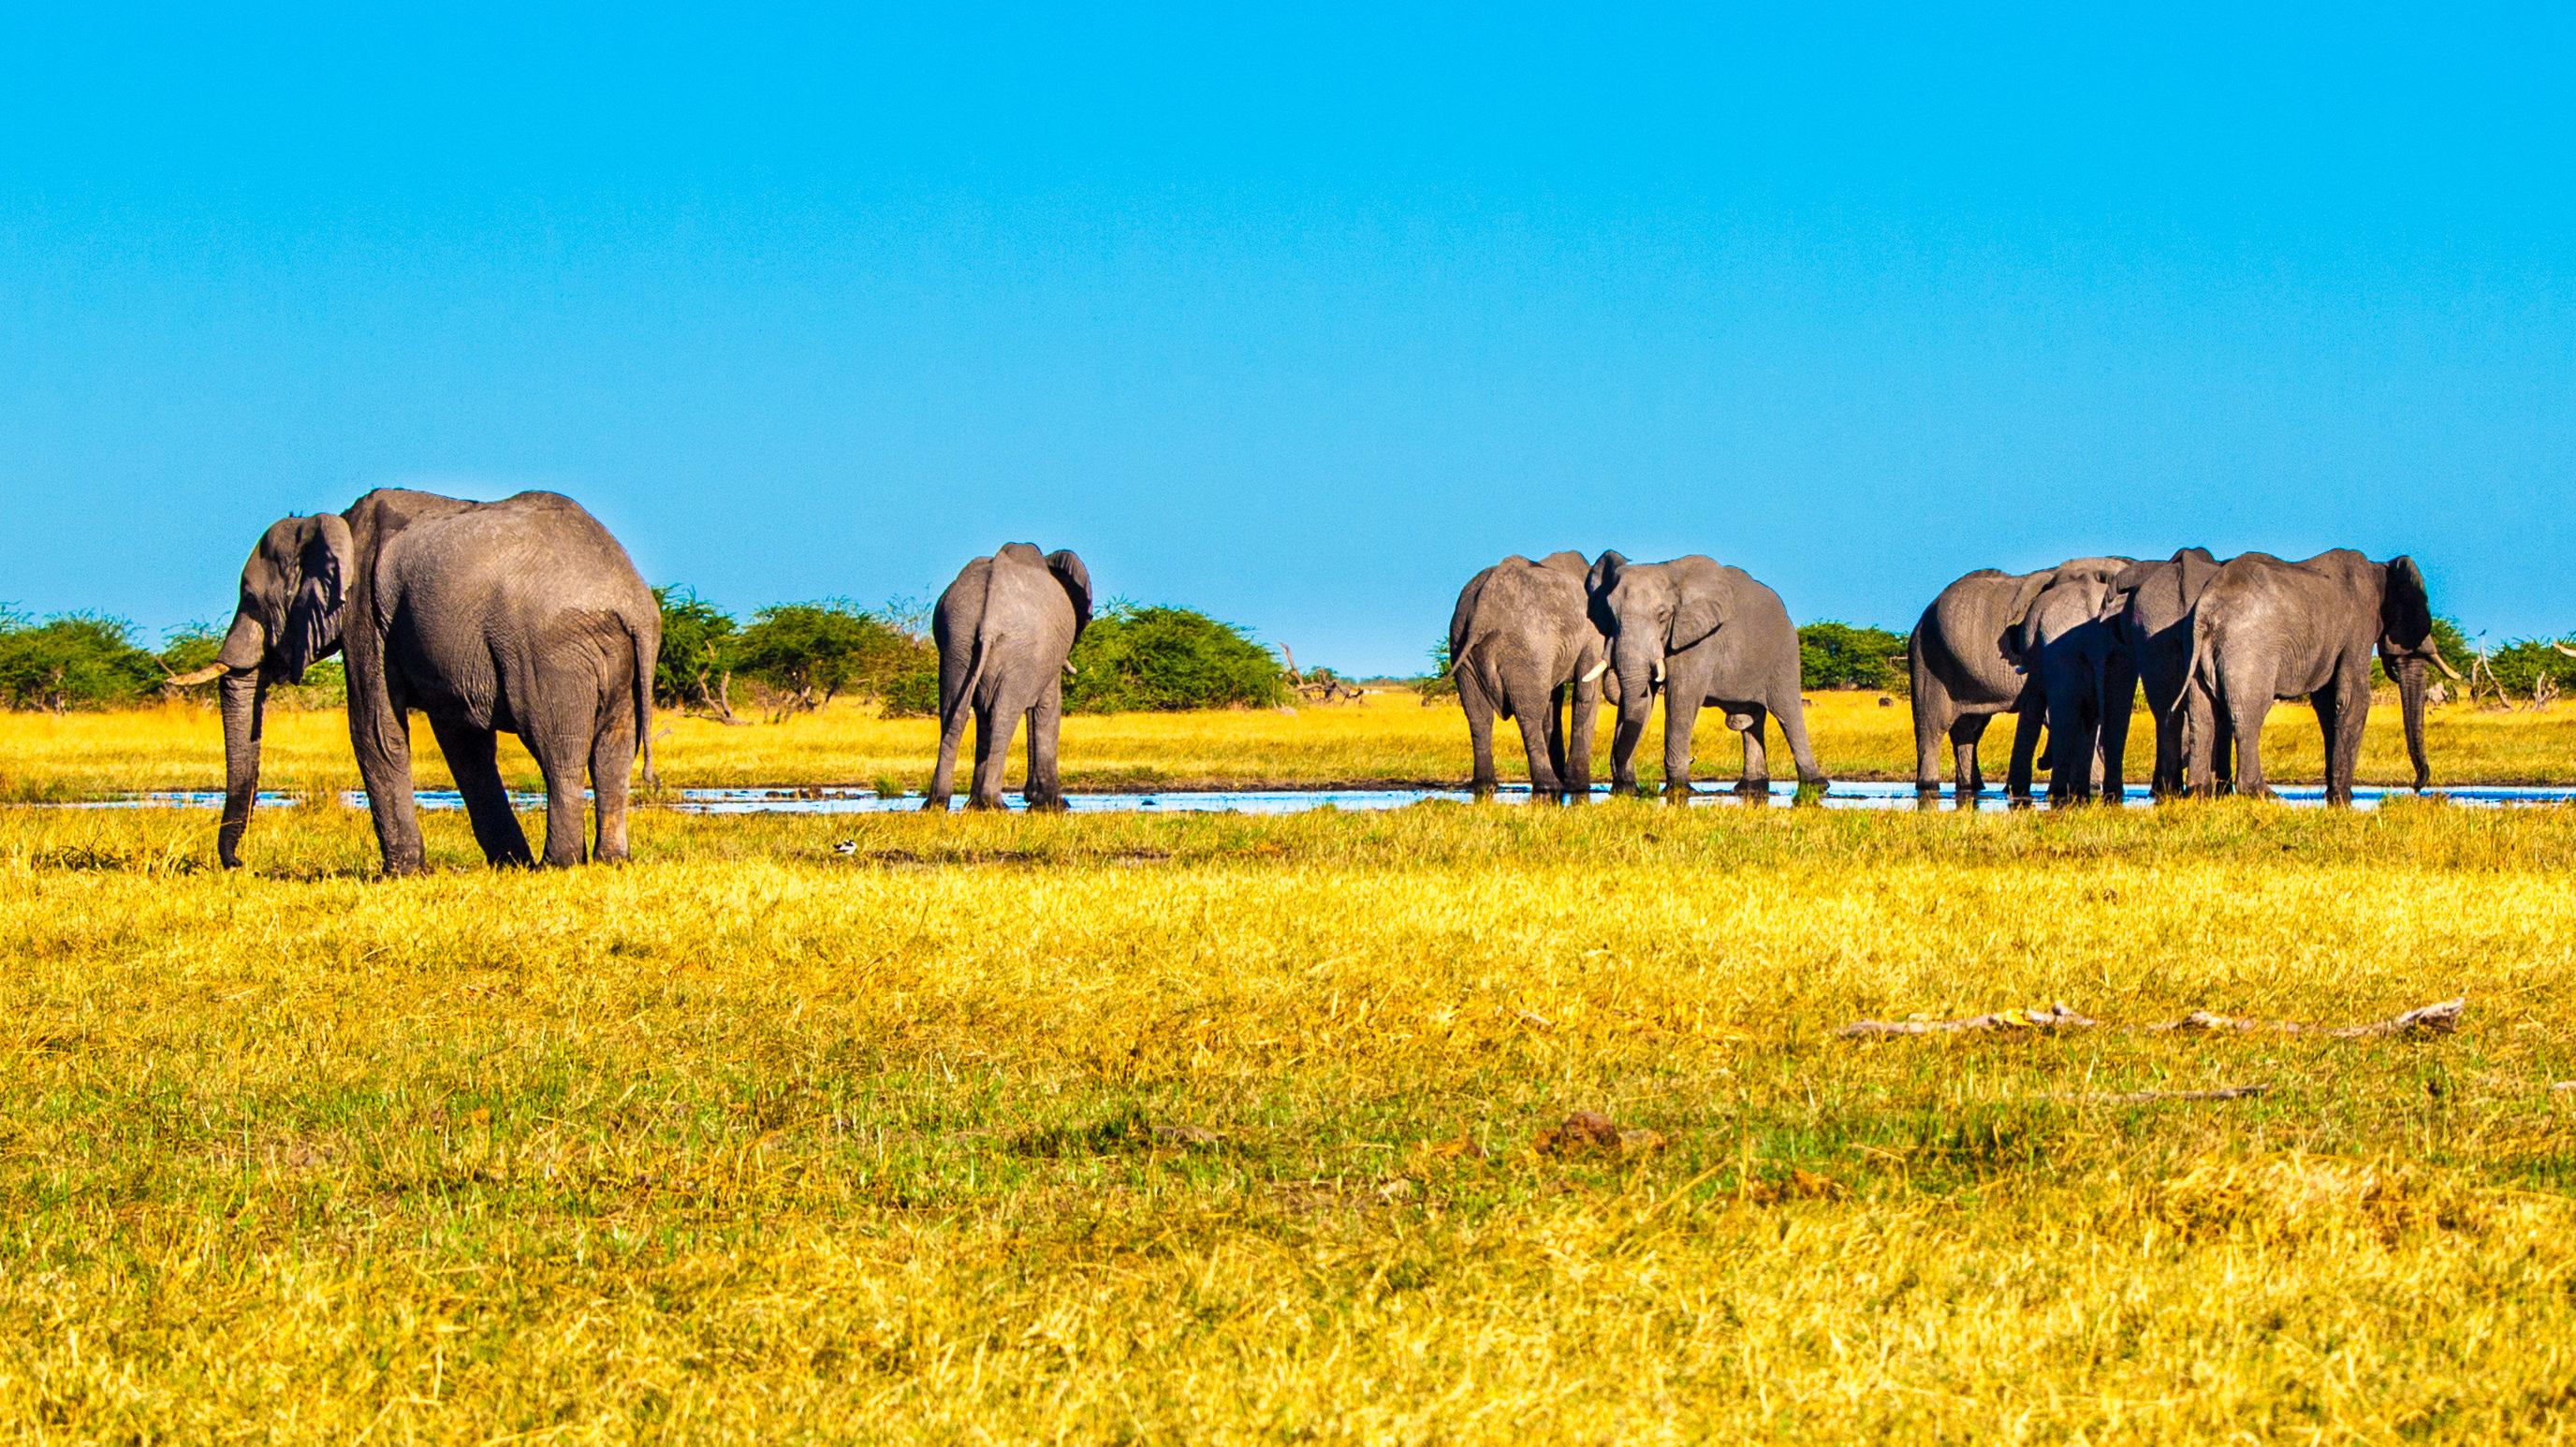 Herd of african elephants at waterhole. Chobe National Park, Okavango Region, Botswana, Africa. Panorama image. - Image [Shutterstock]